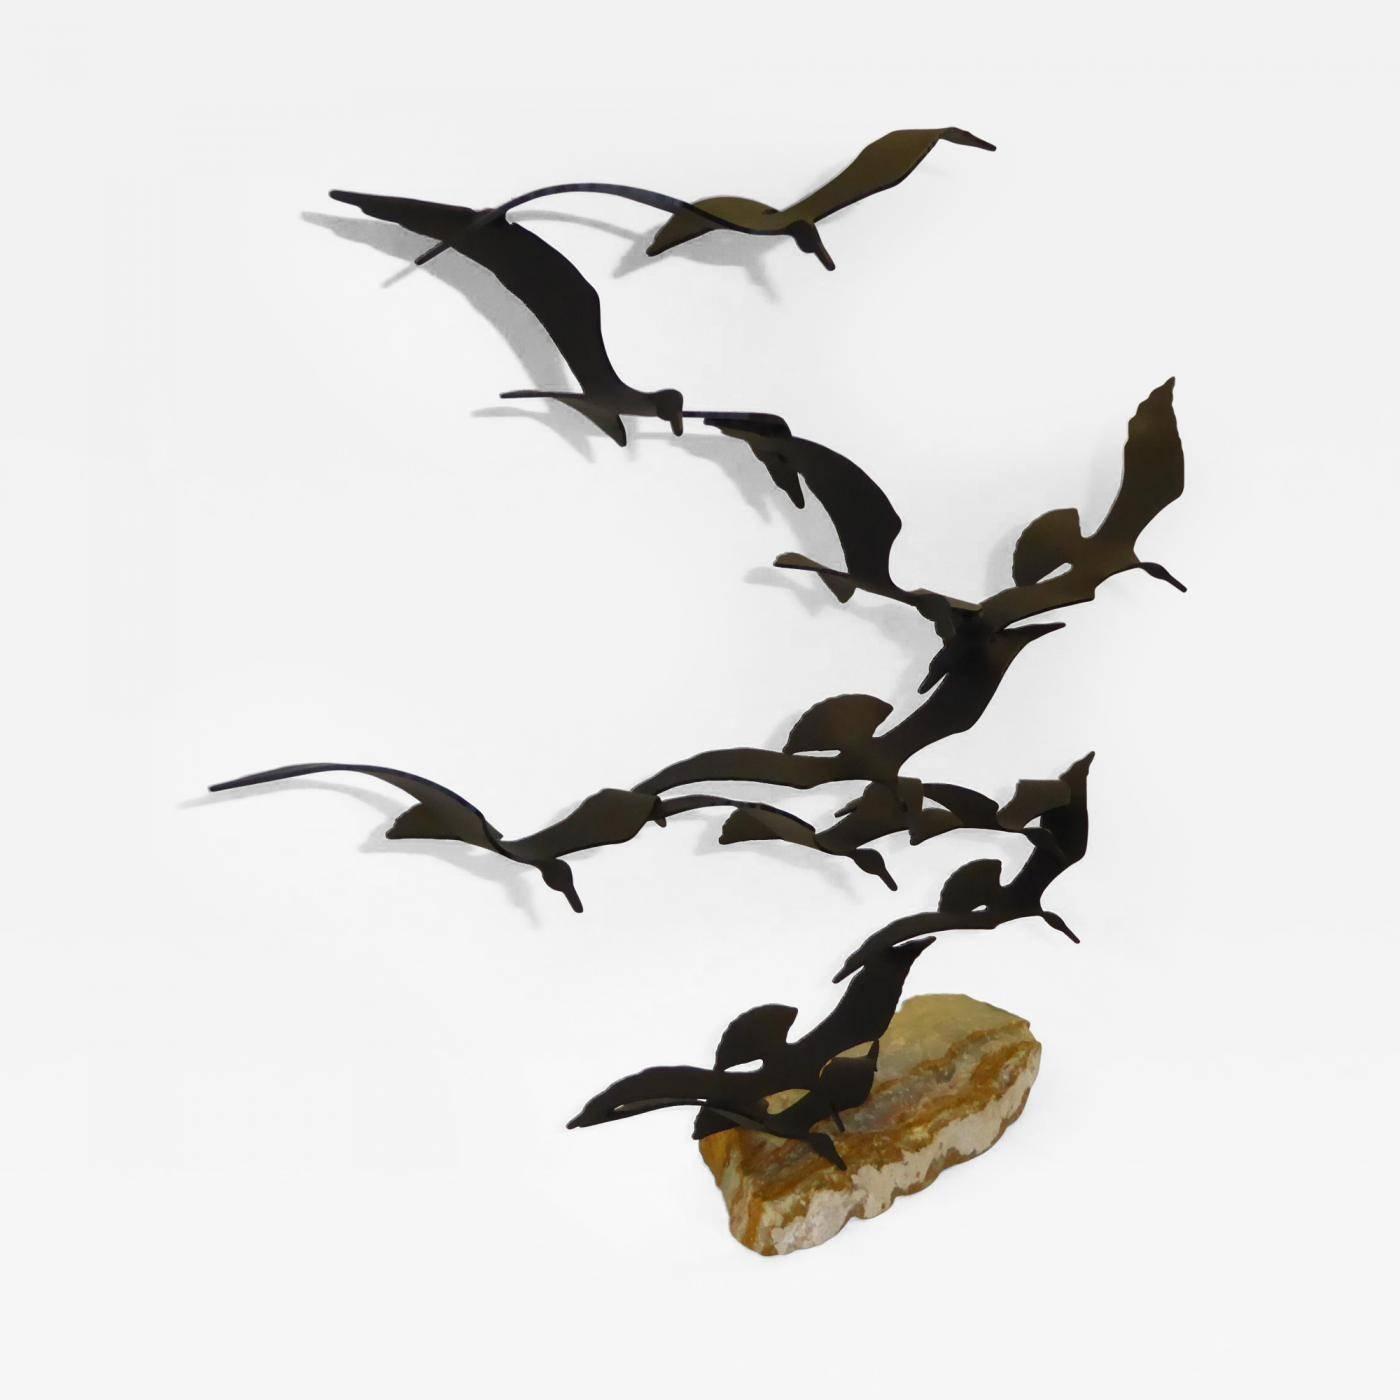 Bijan – Flock Of Seagulls Metal Sculpturebijan, 1970's California In Recent Metal Wall Art Flock Of Seagulls (View 4 of 30)